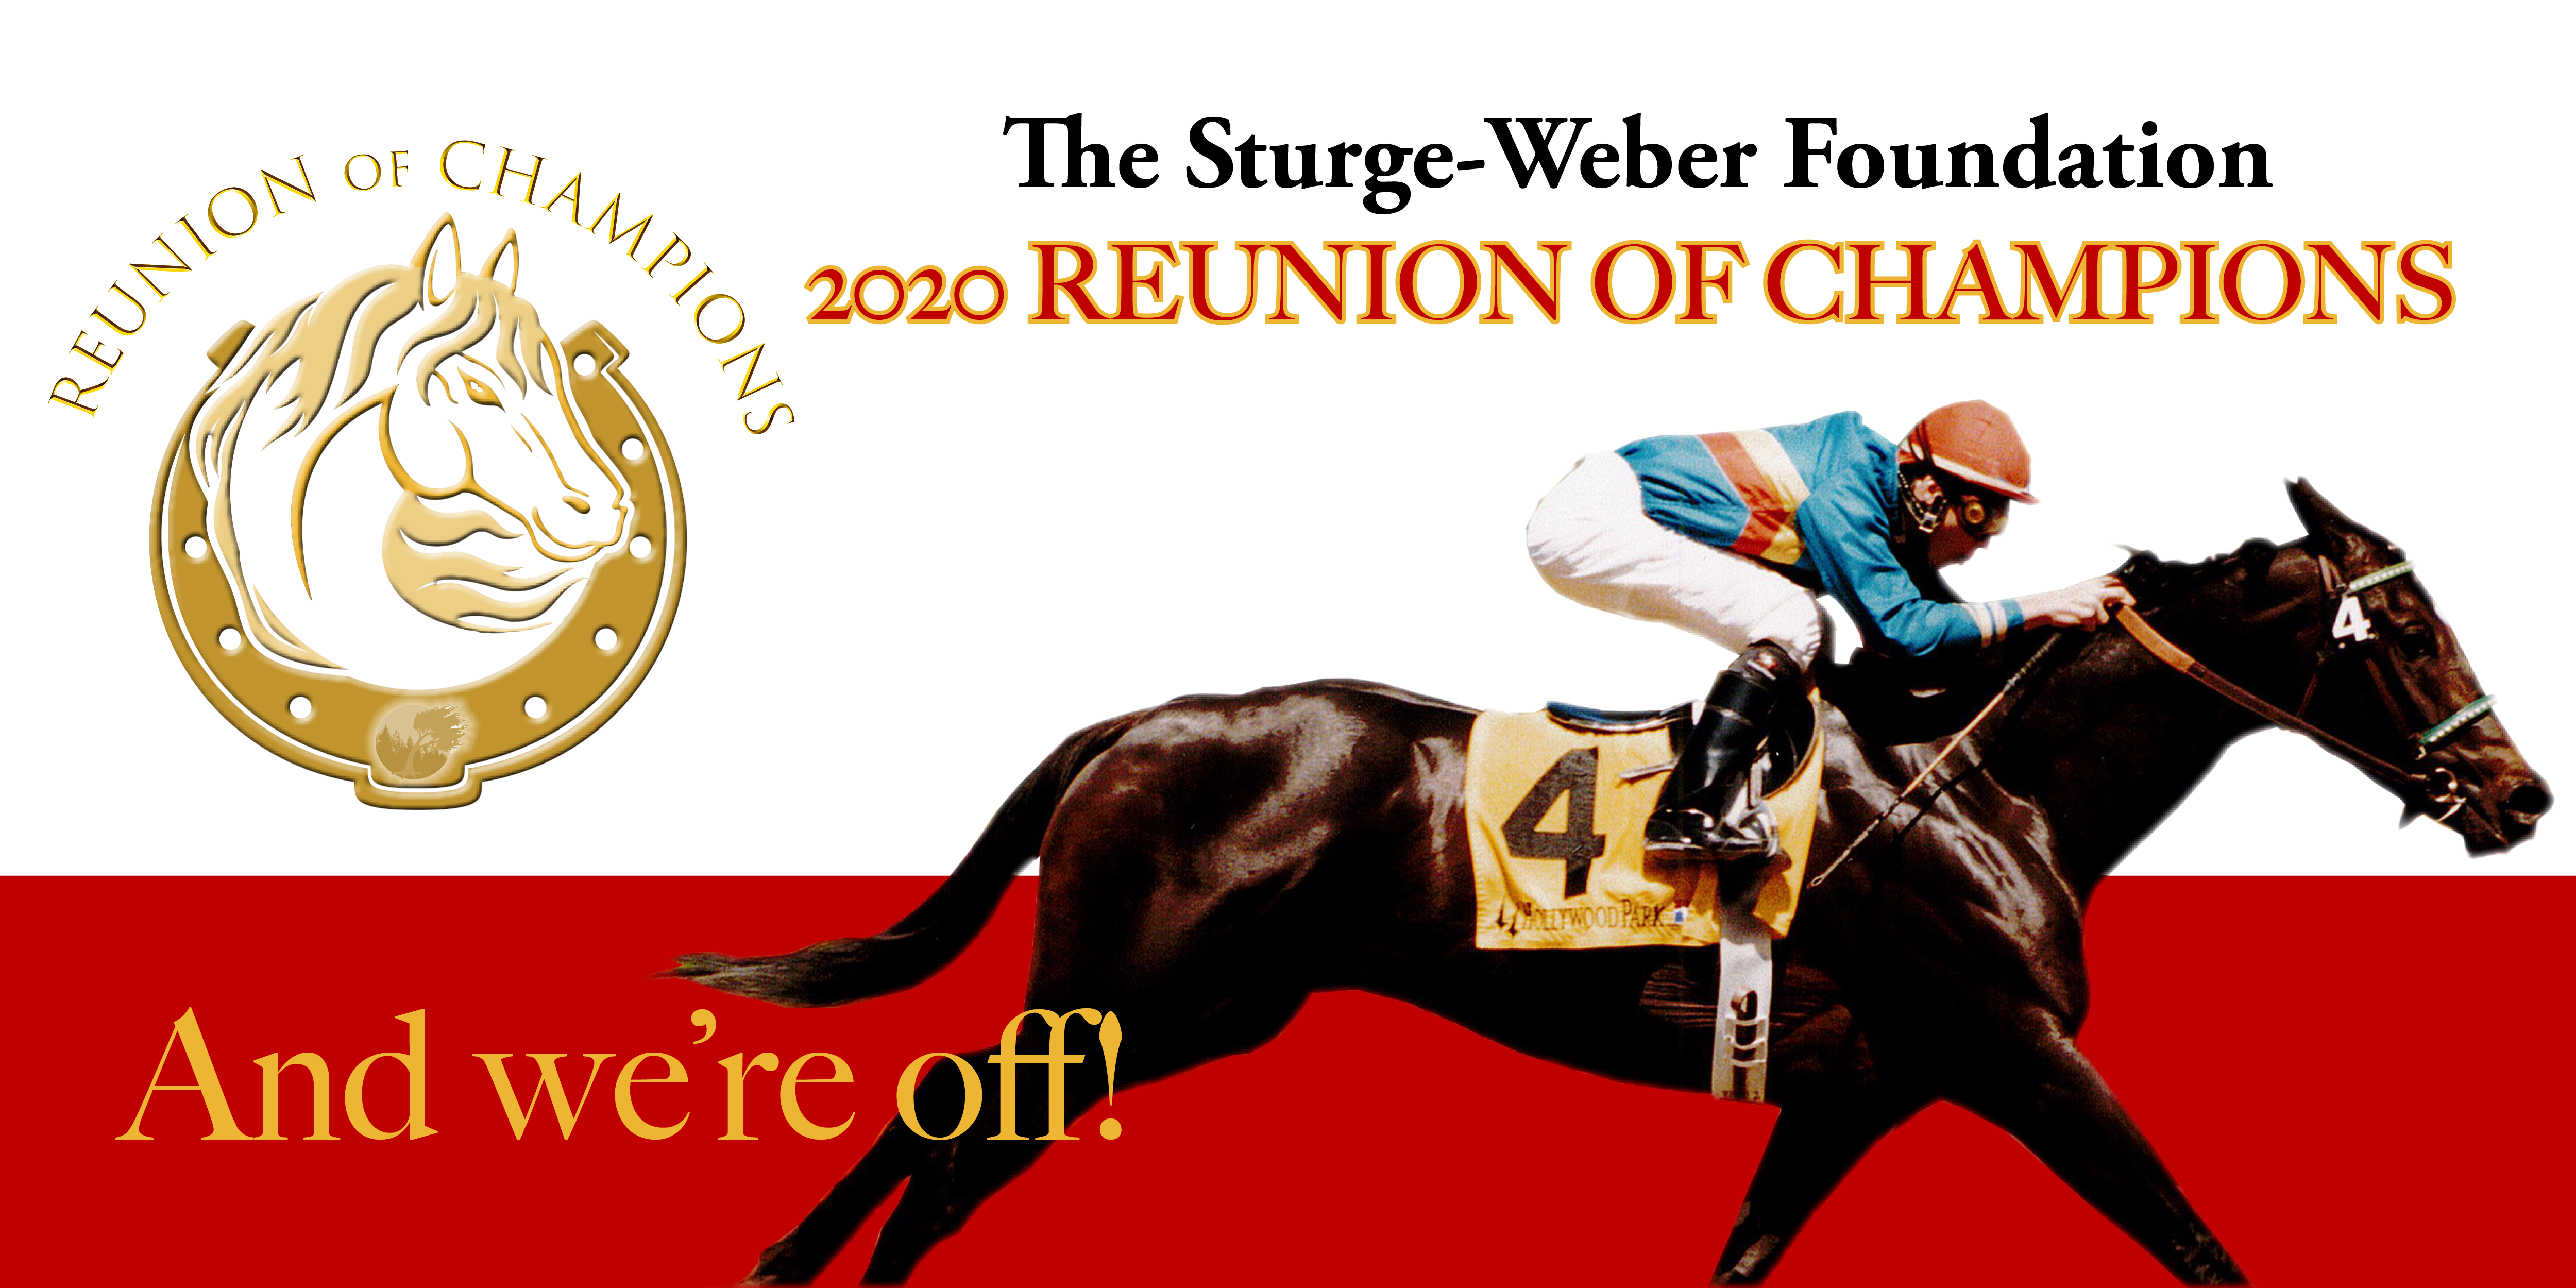 2020 Reunion of Champions